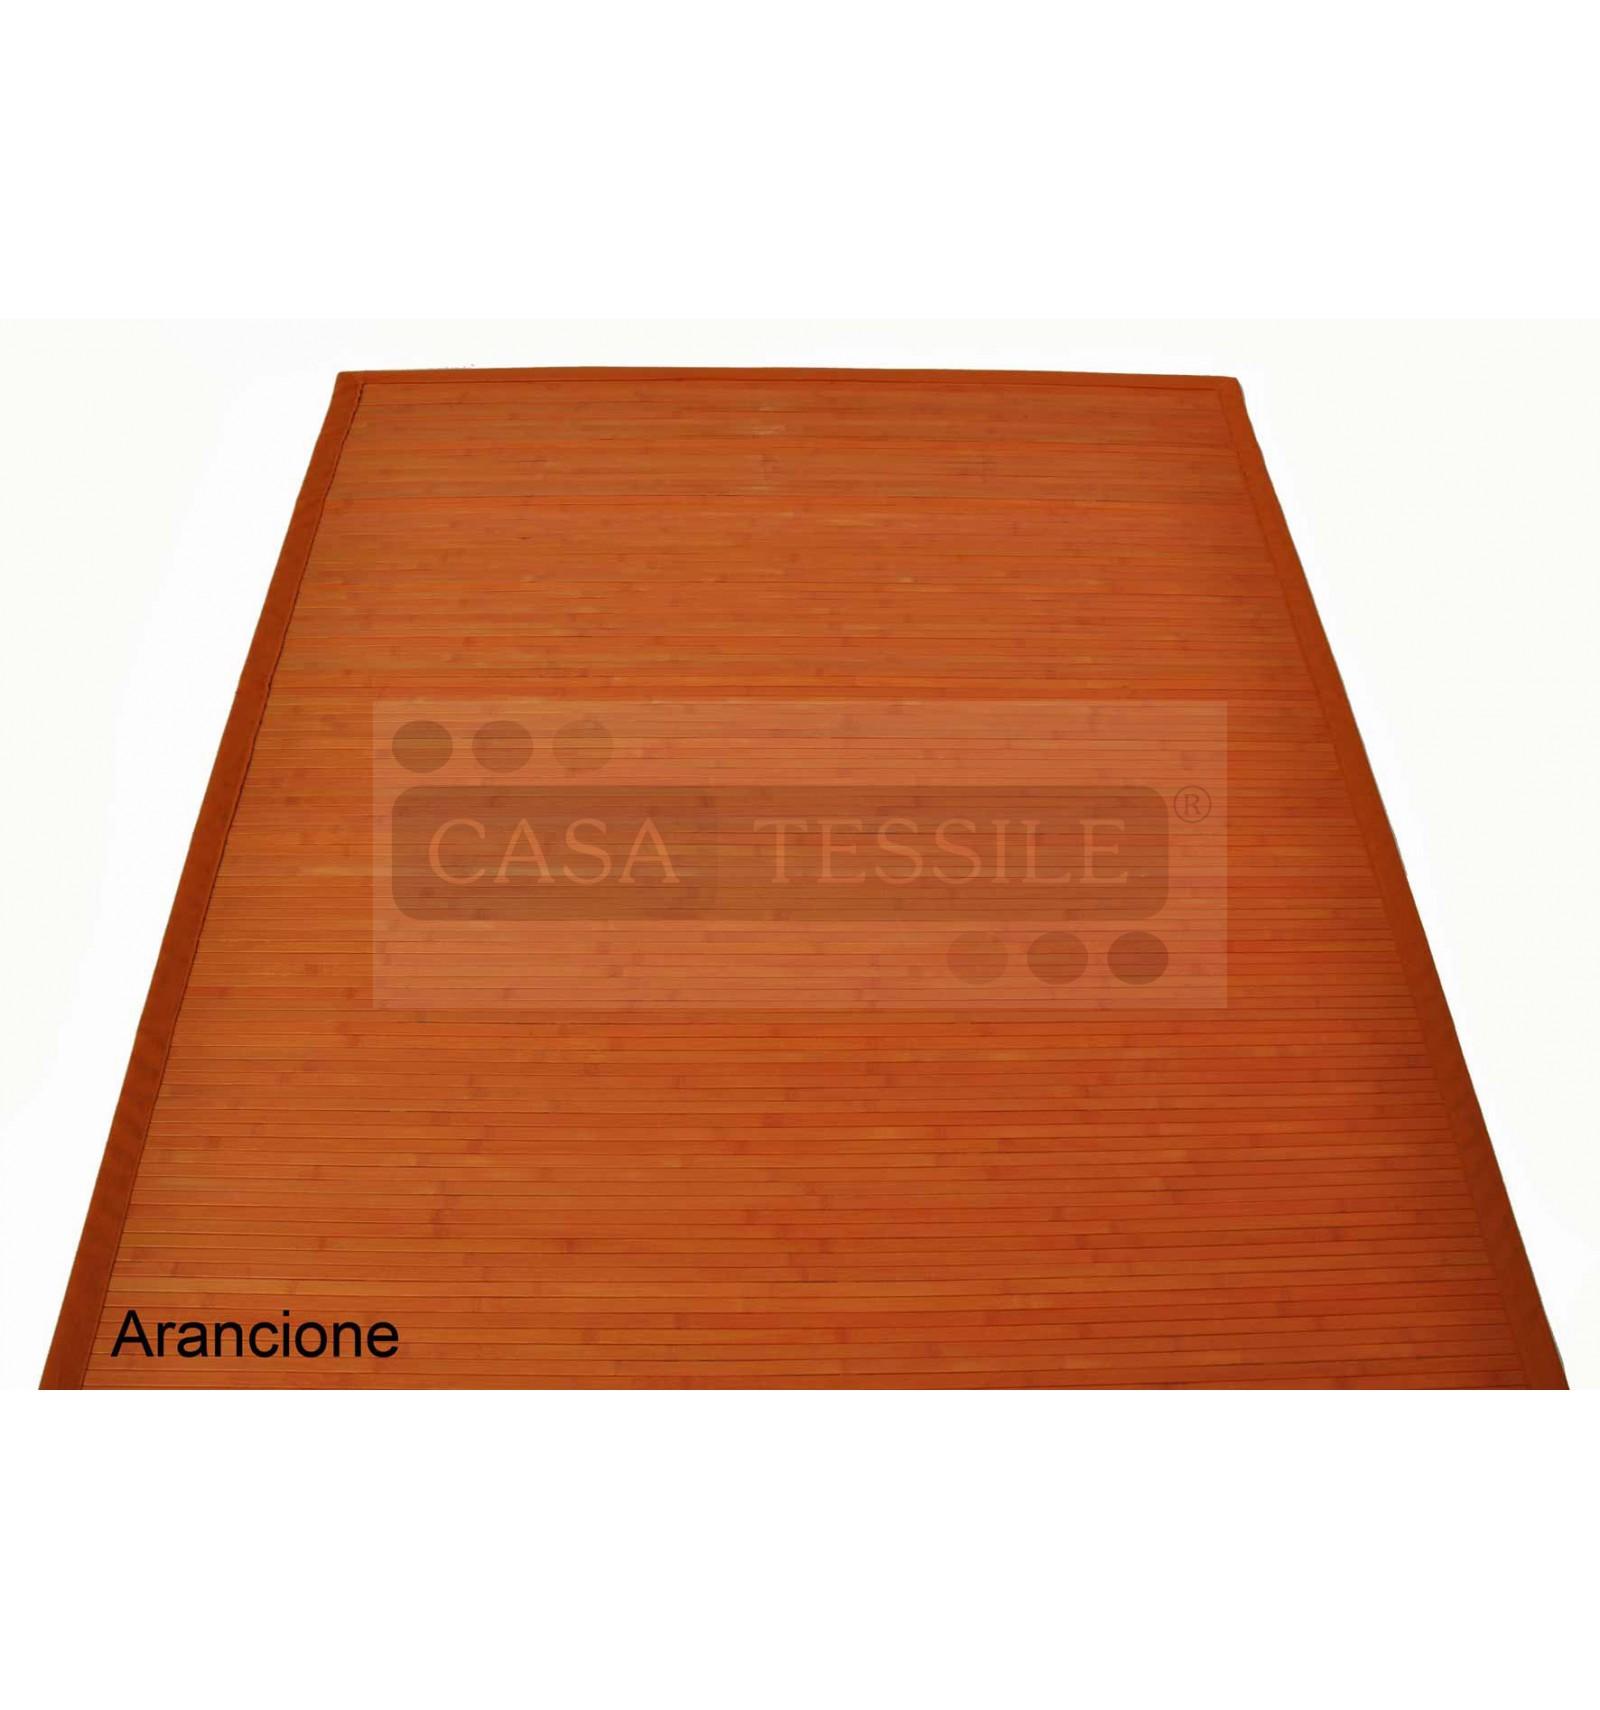 Bamb liscio tappeto passatoia cm 200x300 casa tessile - Tappeto 200x300 ...